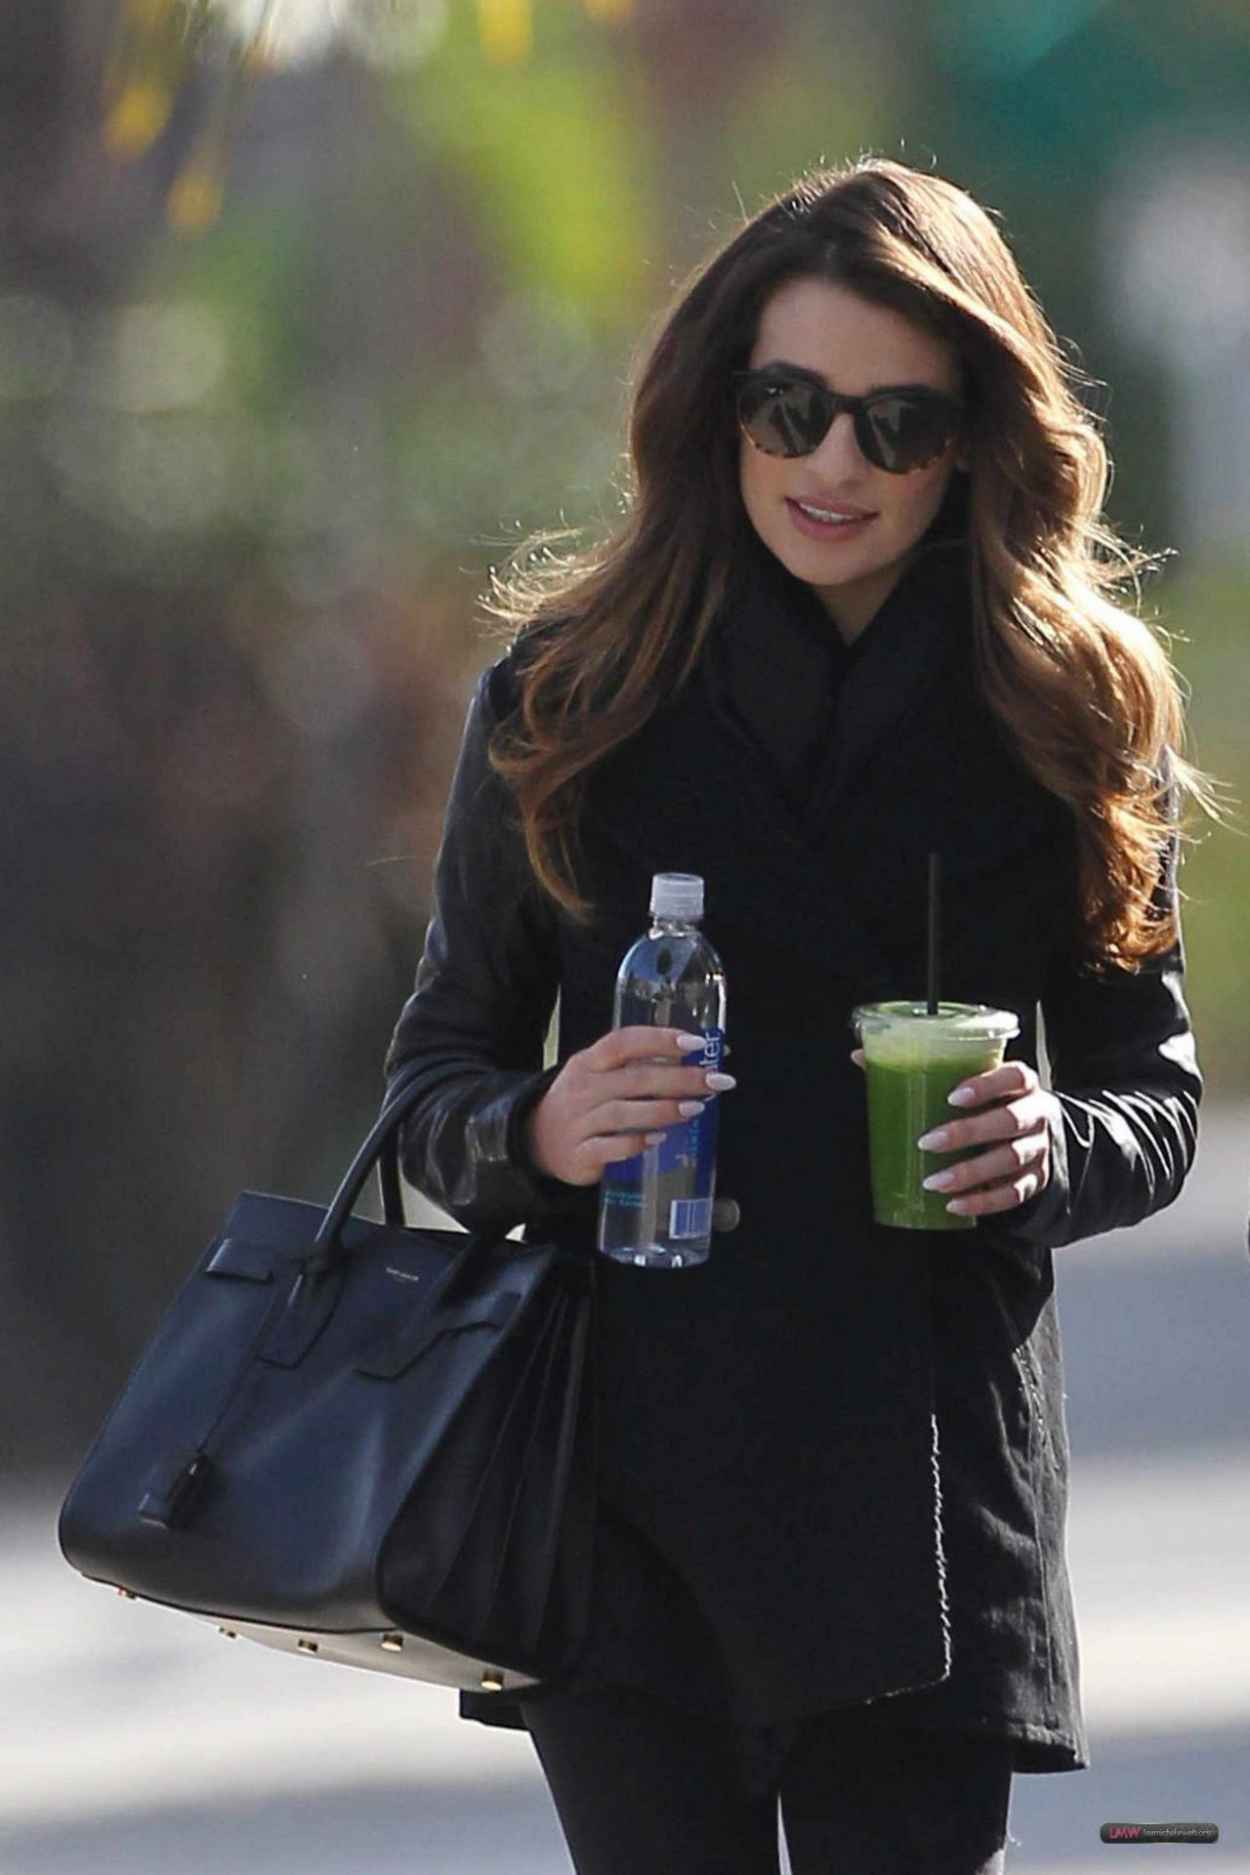 Lea Michele Street Style - Leaving Studio in W. Hollywood - December 2015-5